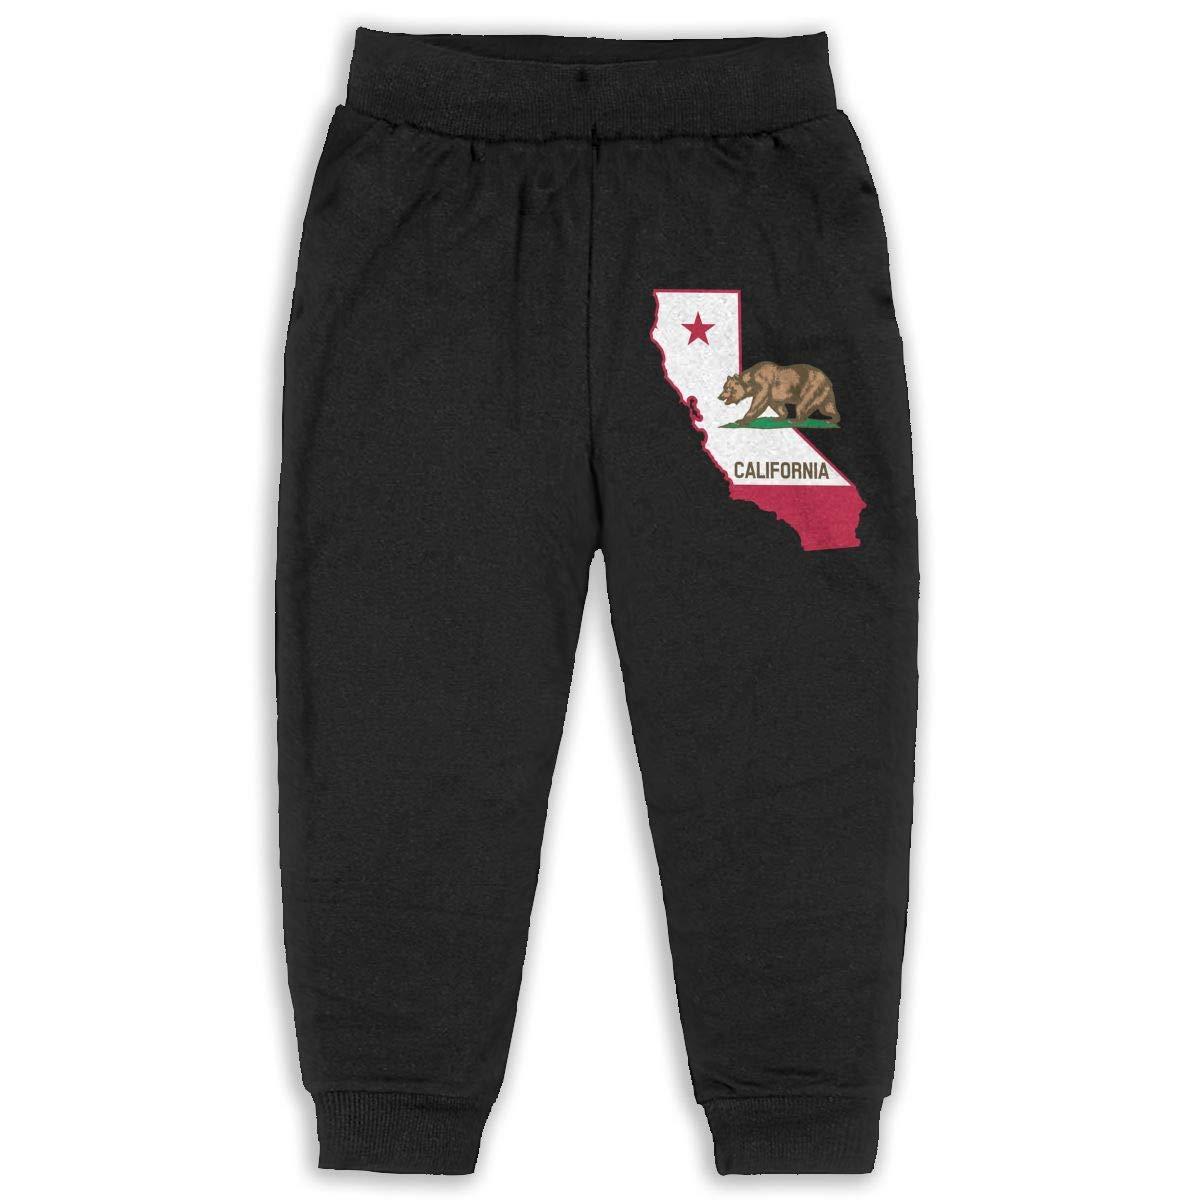 DaXi1 California Sweatpants for Boys /& Girls Fleece Active Joggers Elastic Pants